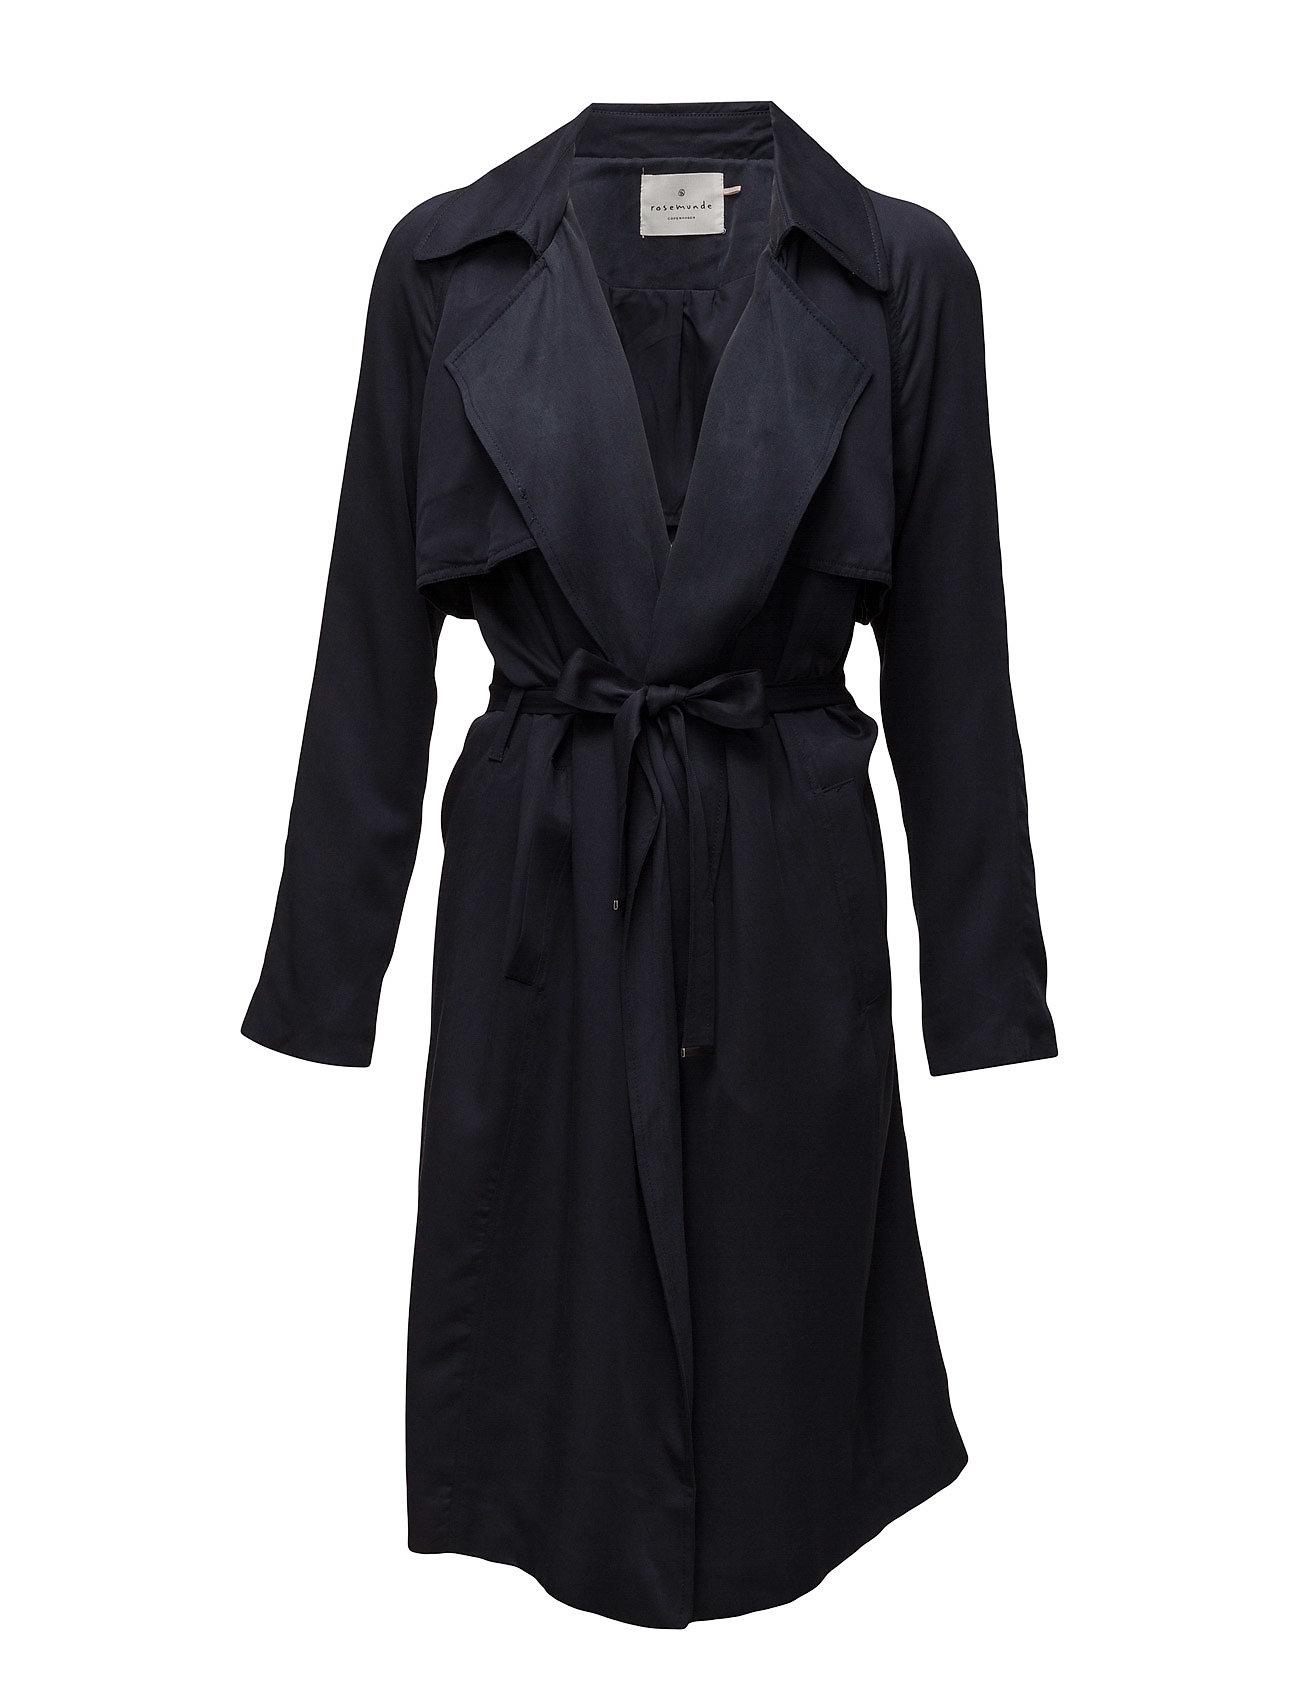 Coat Ls Rosemunde Frakker til Kvinder i Mørkeblå